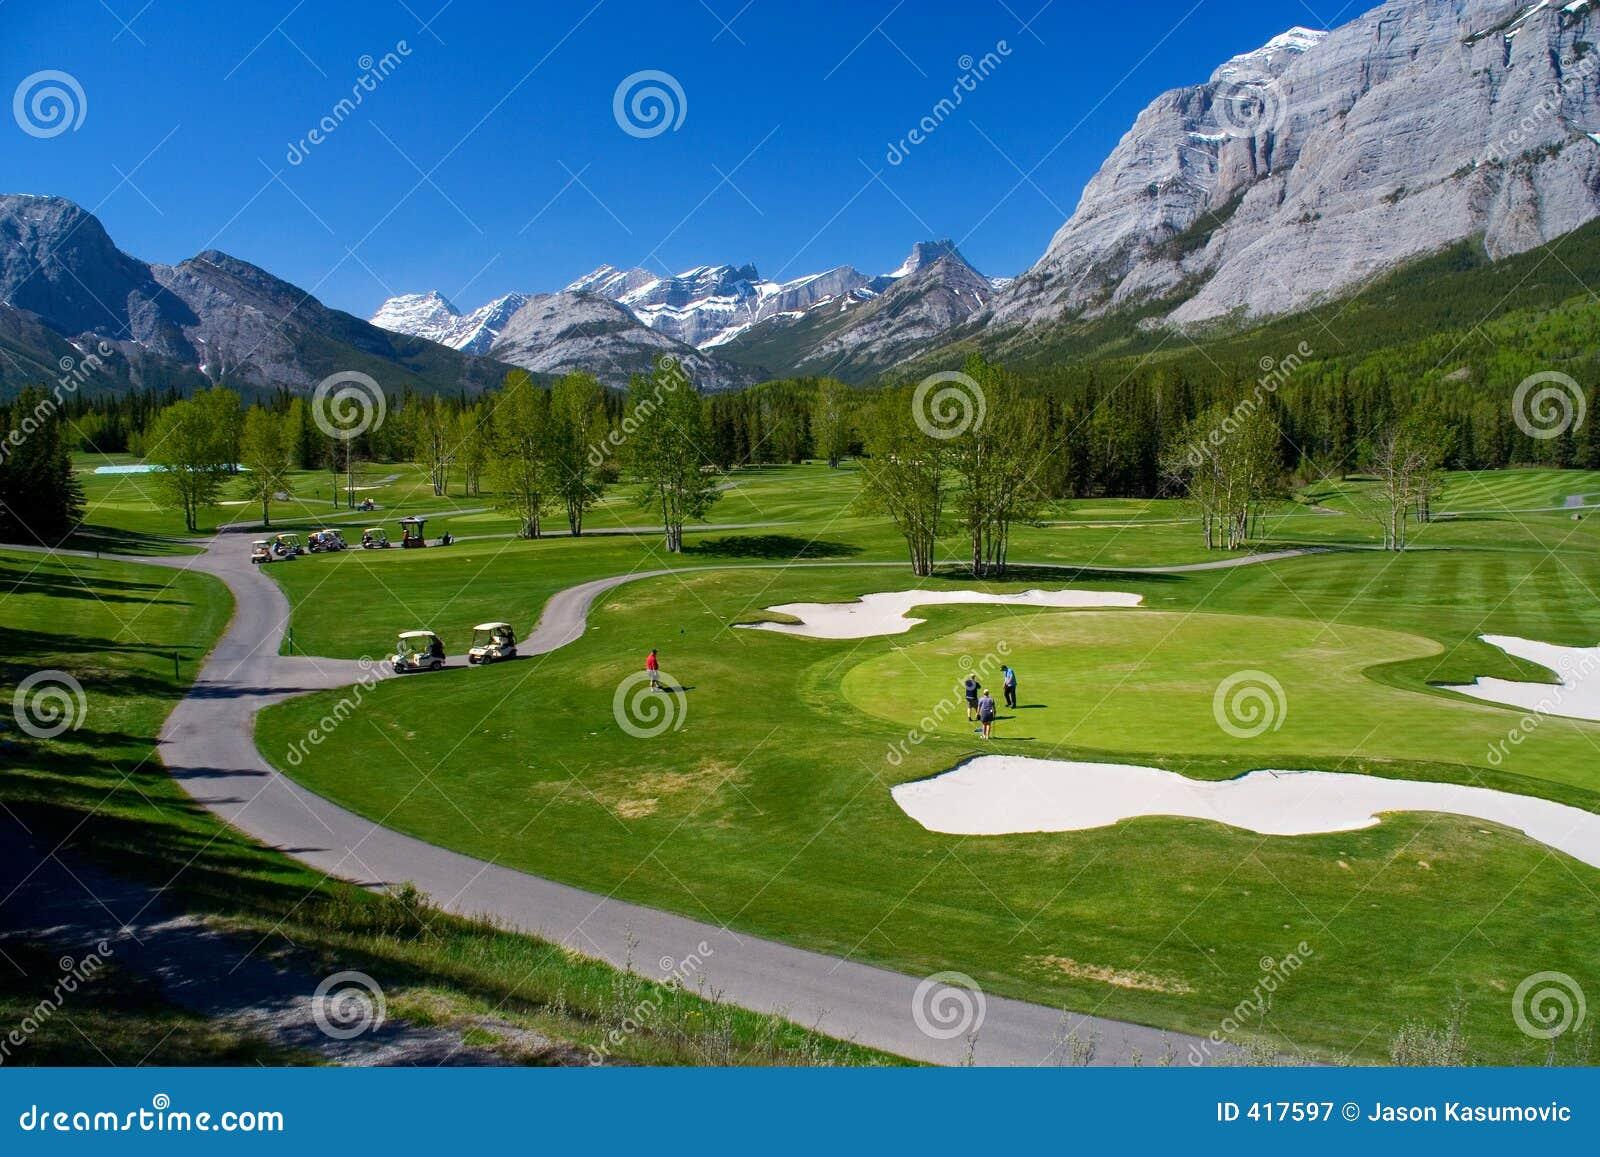 Kananaskis Golf Course